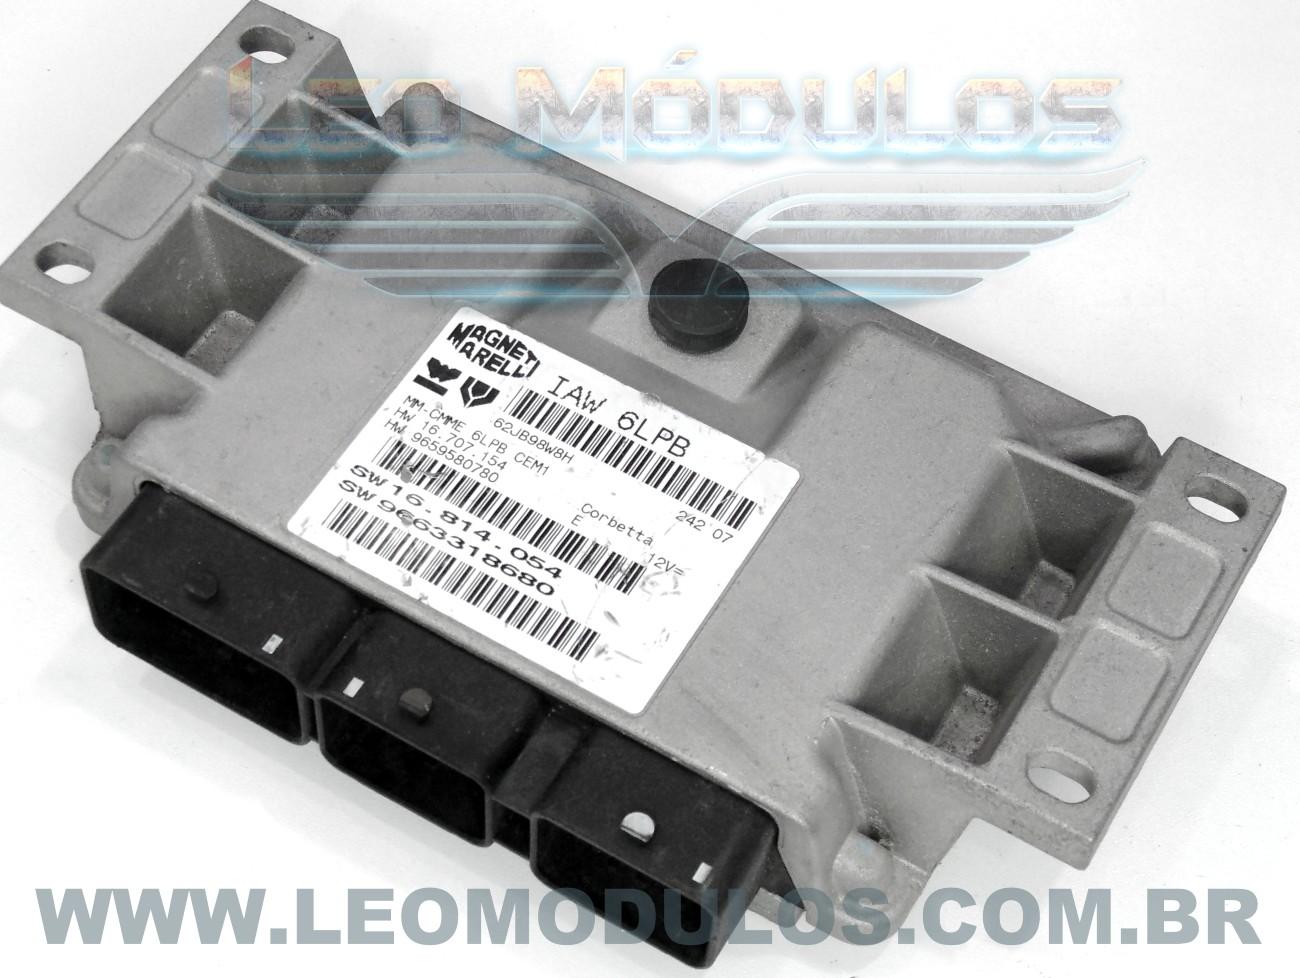 Módulo de injeção marelli - IAW 6LPB - 16.814.054 - 9663318680 - Citroen C4 Picasso Peugeot 307 2.0 16V - IAW 6LPB - Leo Módulos